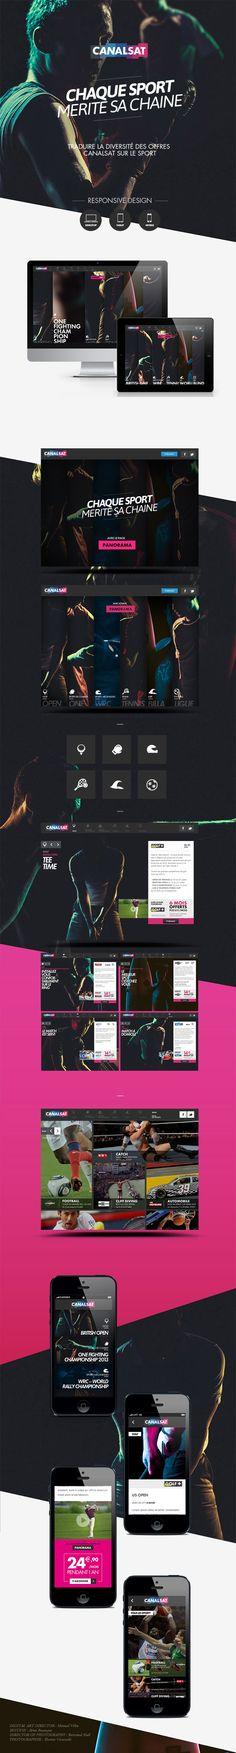 Canalsat Sport 2013 by Manuel Vélin, via Behance #photography #webdesign #layout